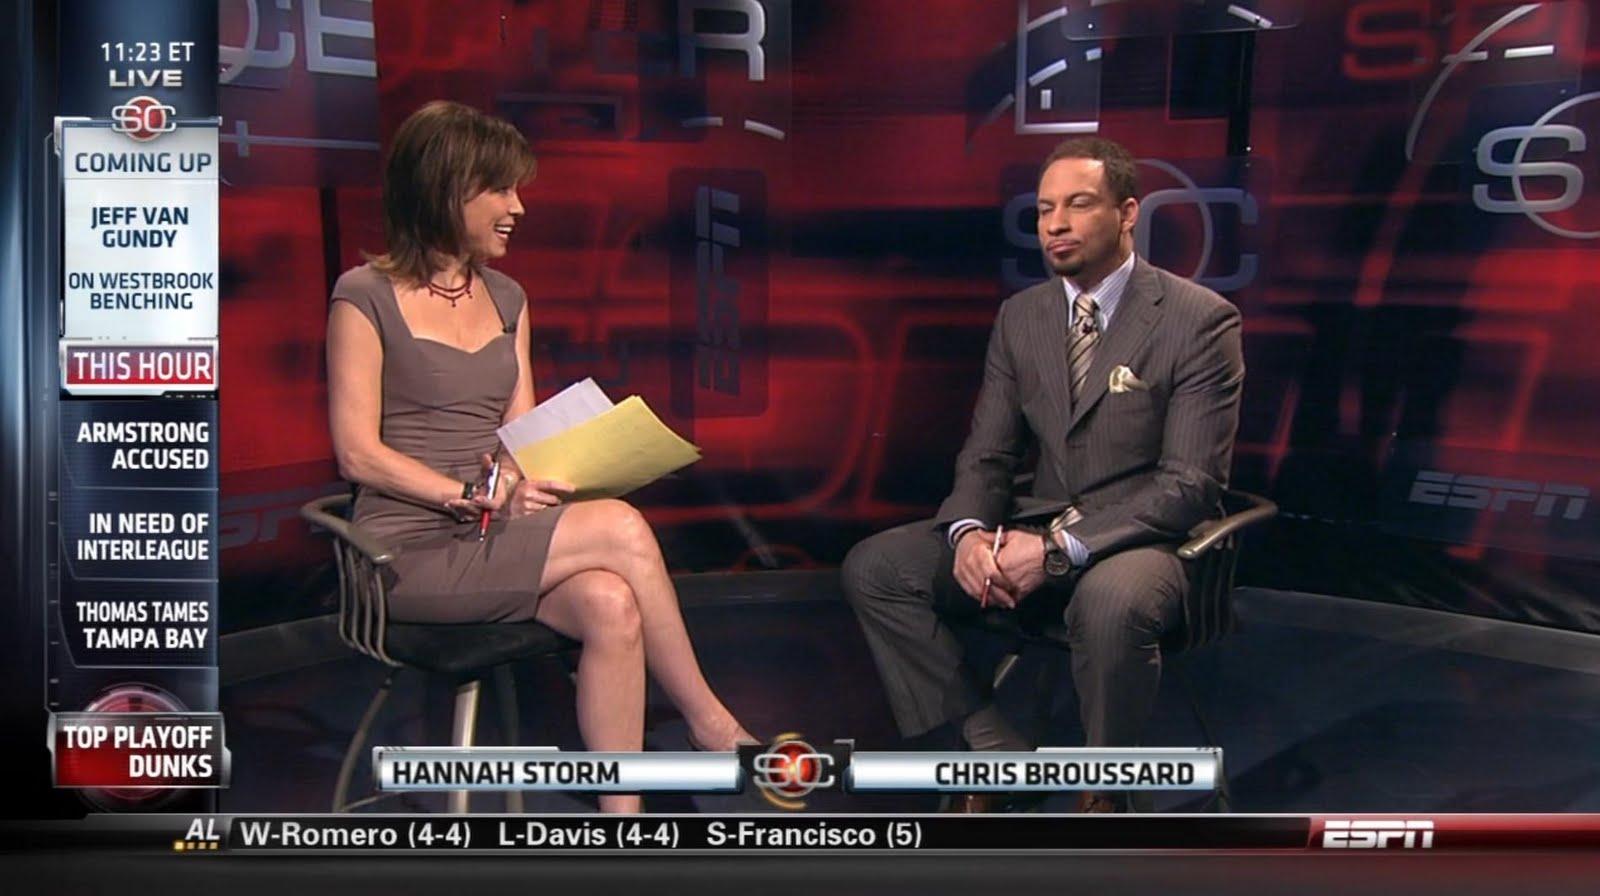 ESPN's Hannah Storm Sexy Legs On Sportscenter - Sexy Leg Cross